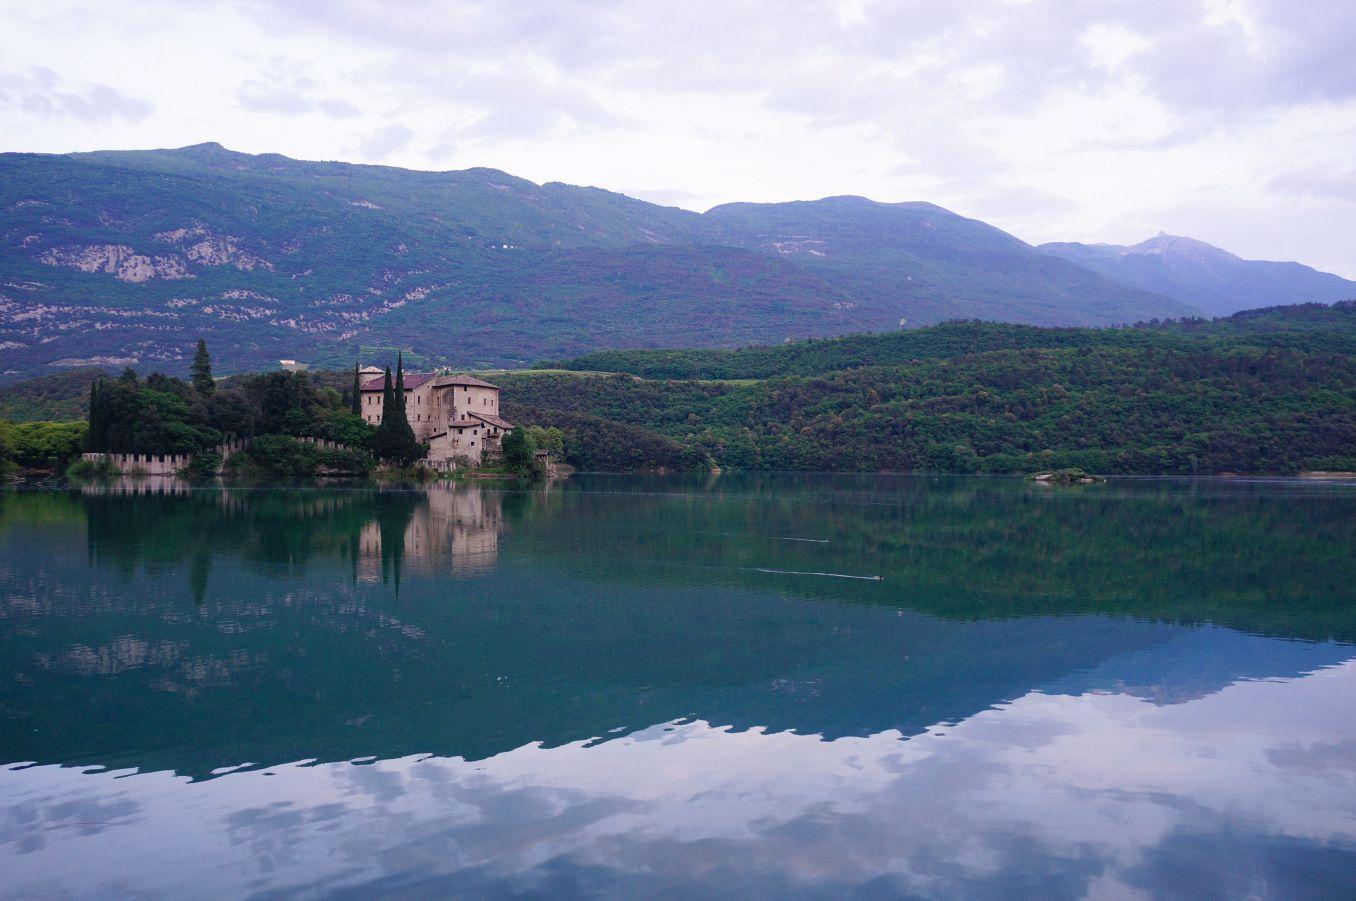 Castle Toblino, Italy  #castle #lake #fairytale #travel #photography #italy #italia #toblino #mountains #scenery